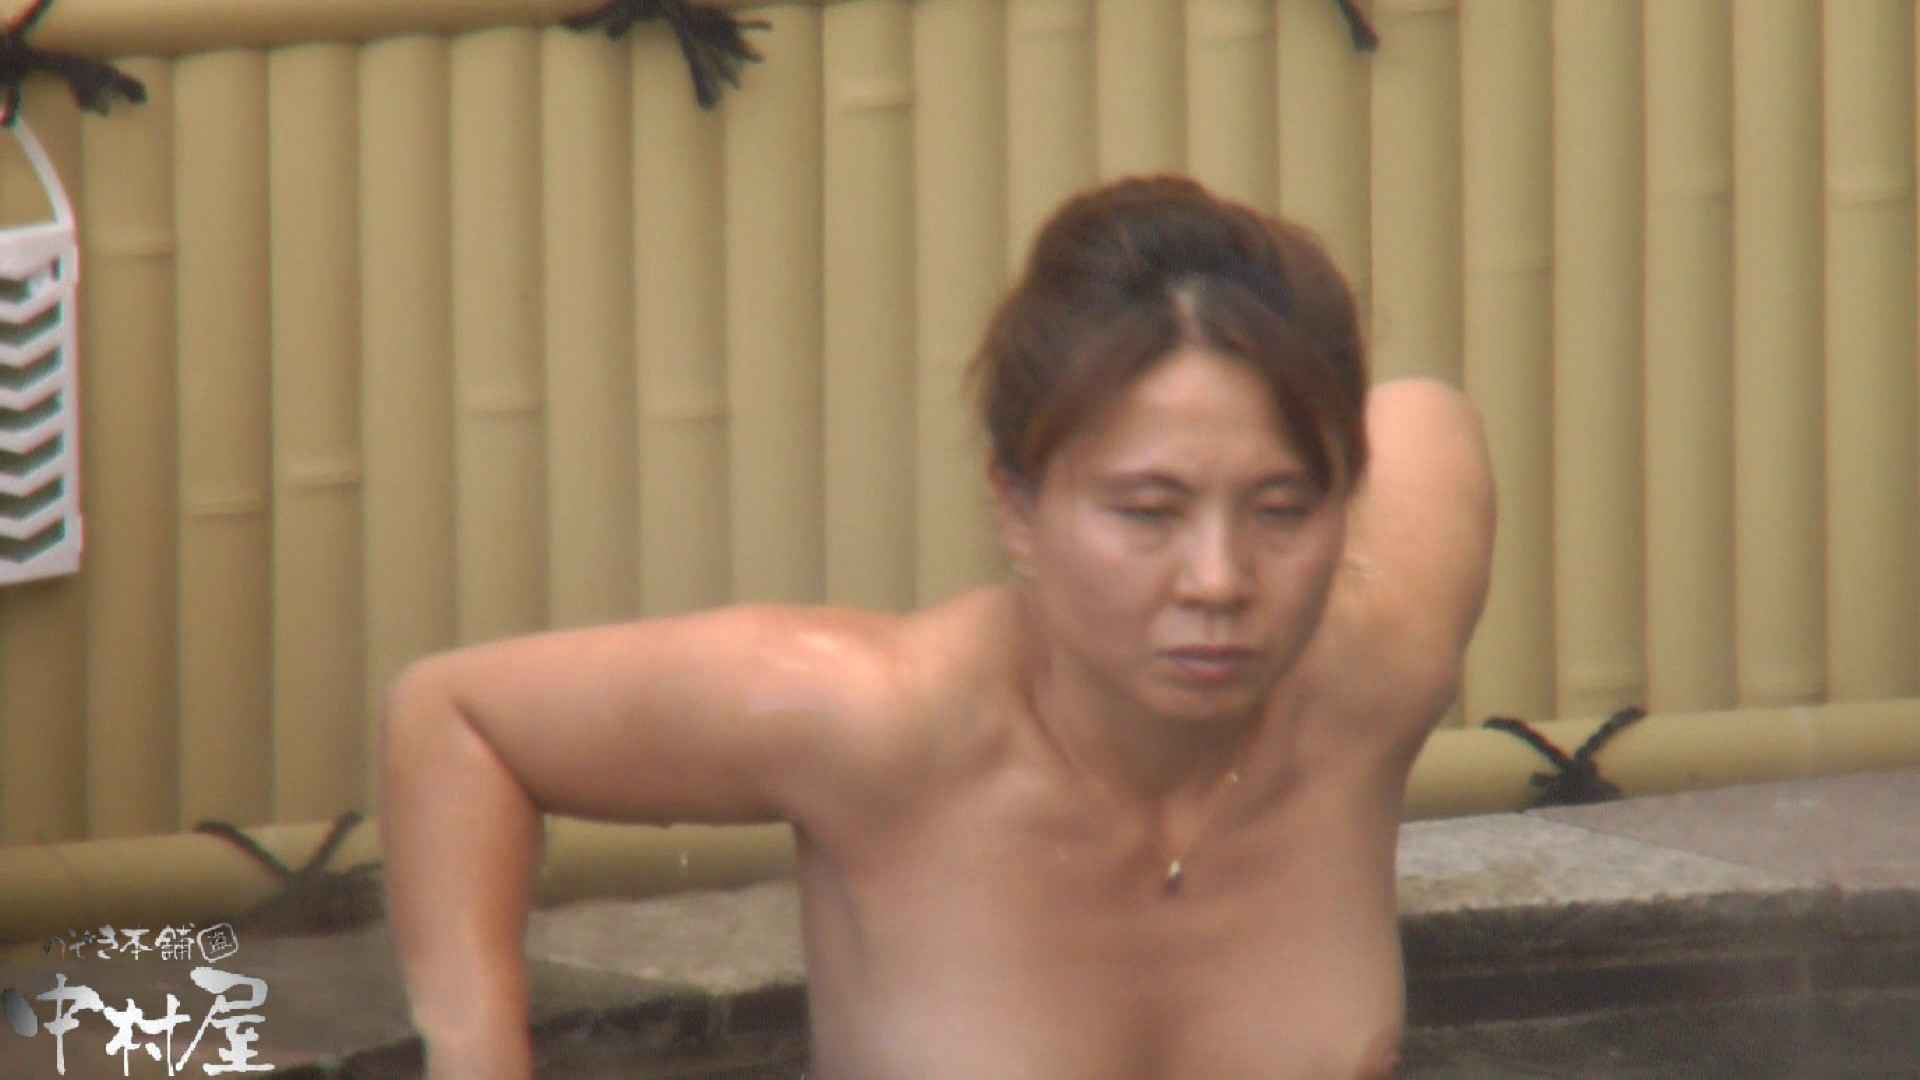 Aquaな露天風呂Vol.915 OLすけべ画像 オマンコ動画キャプチャ 99連発 11